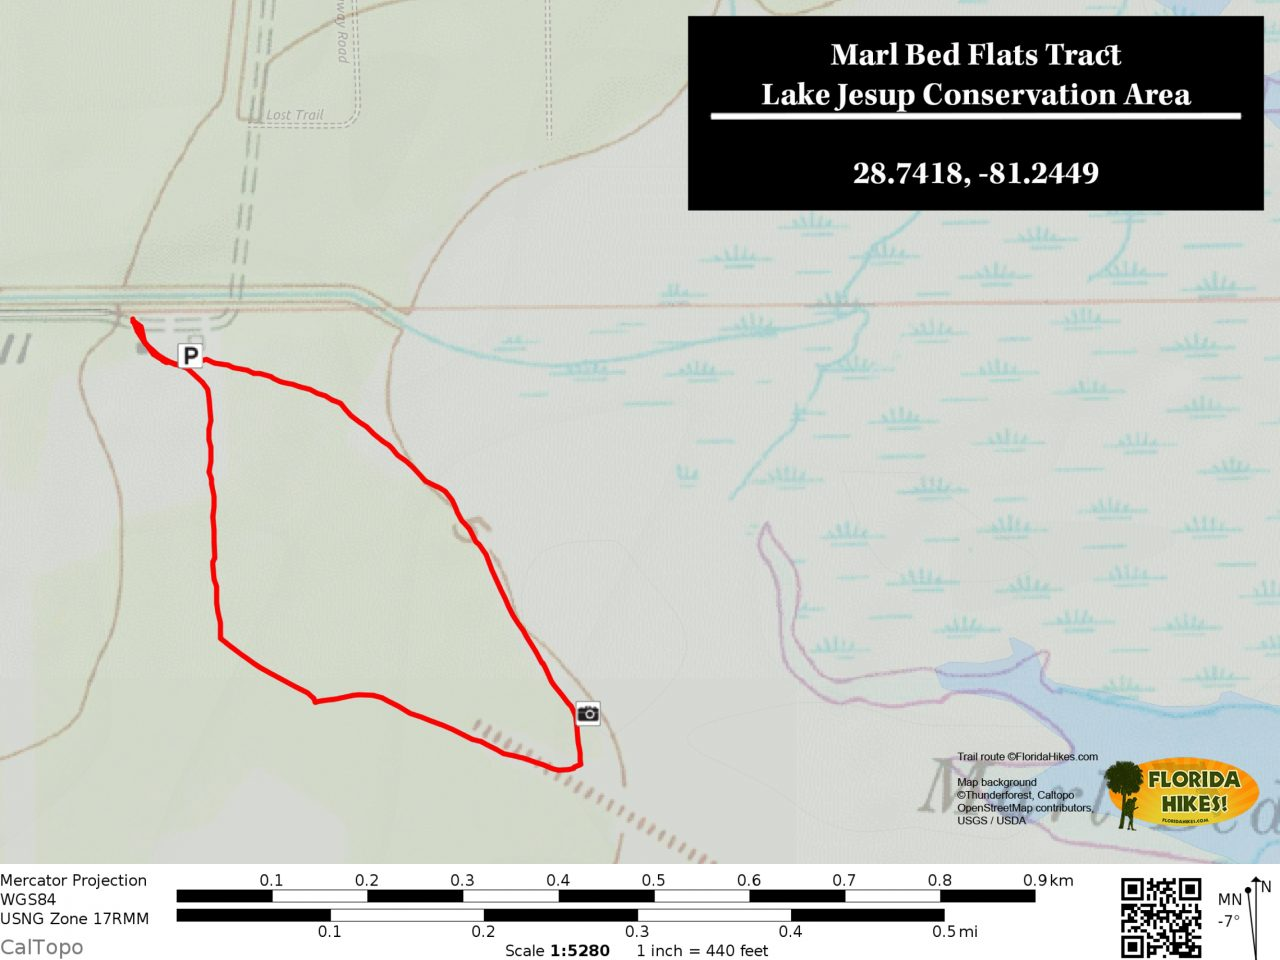 Lake Jesup Marl Bed Flats trail map